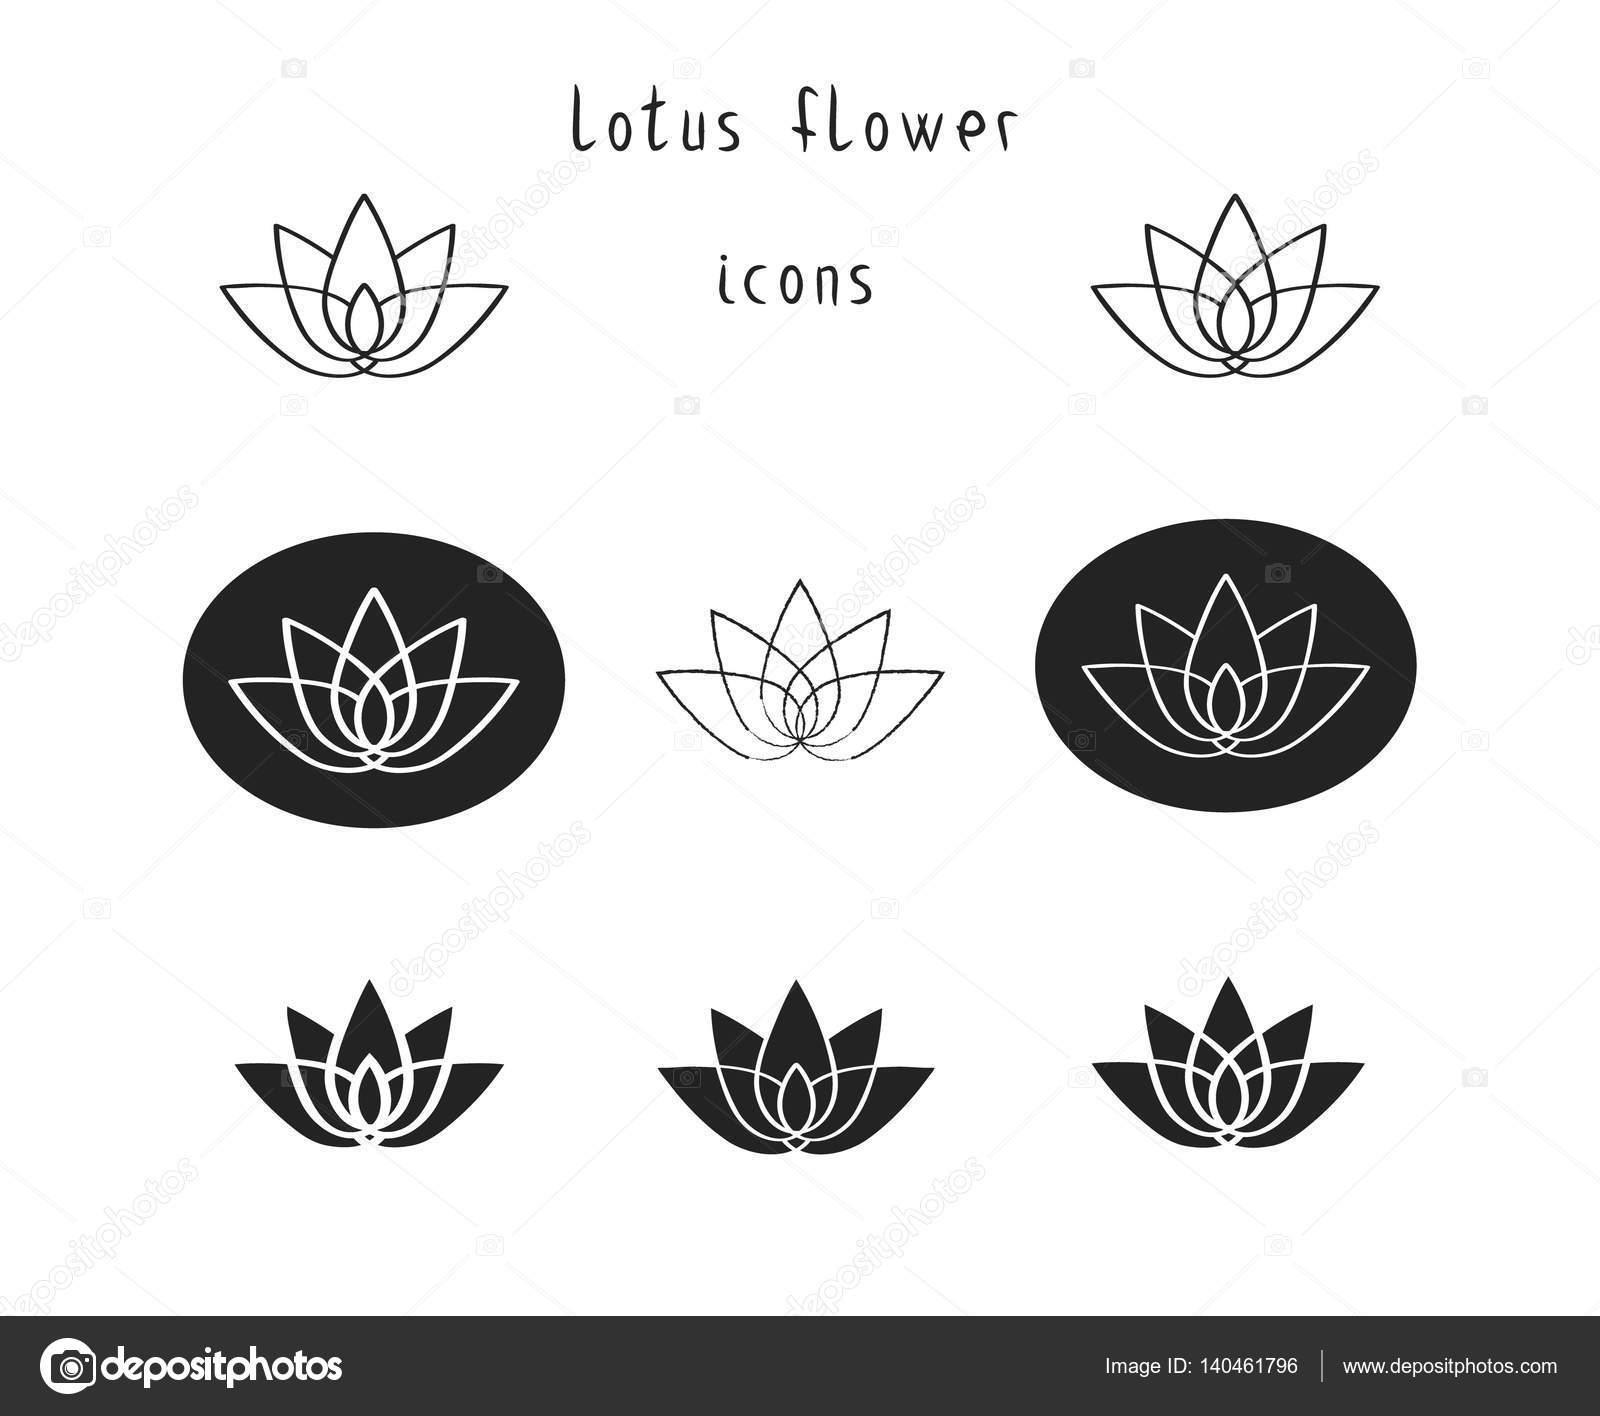 Lotus flower icons set stock vector annaboro 140461796 lotus flower icons set stock vector mightylinksfo